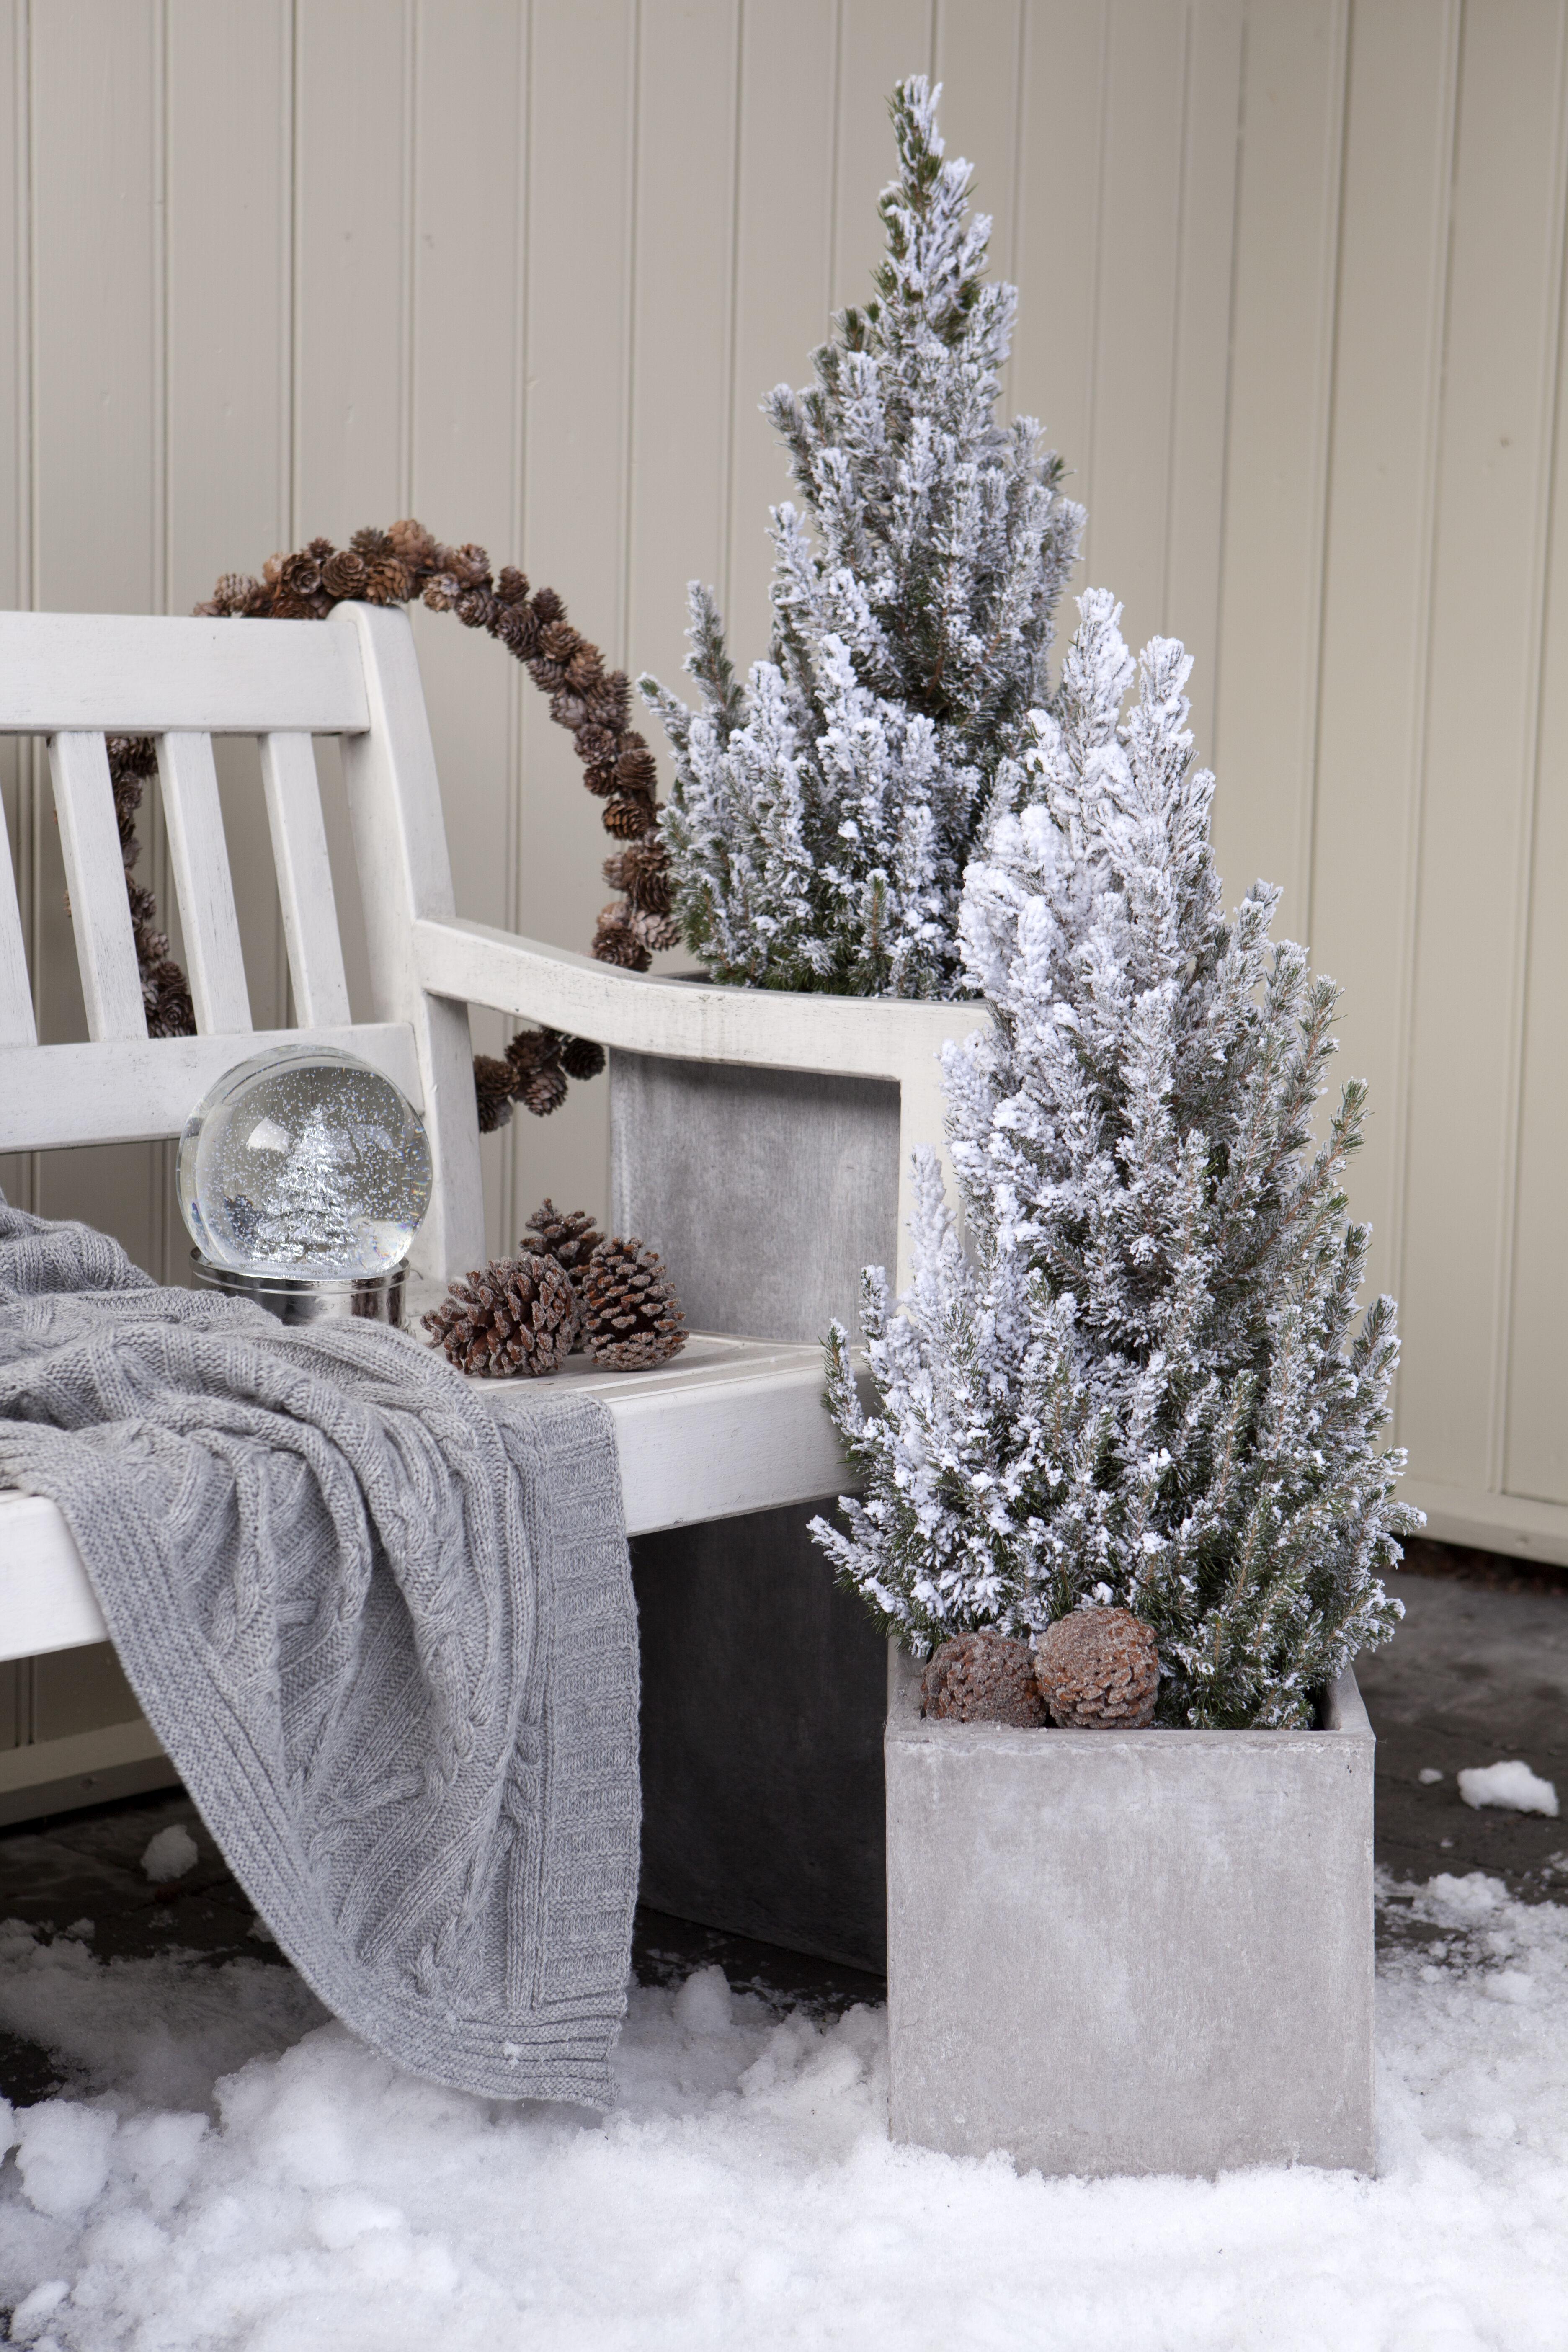 Frostet vintergrønn busk